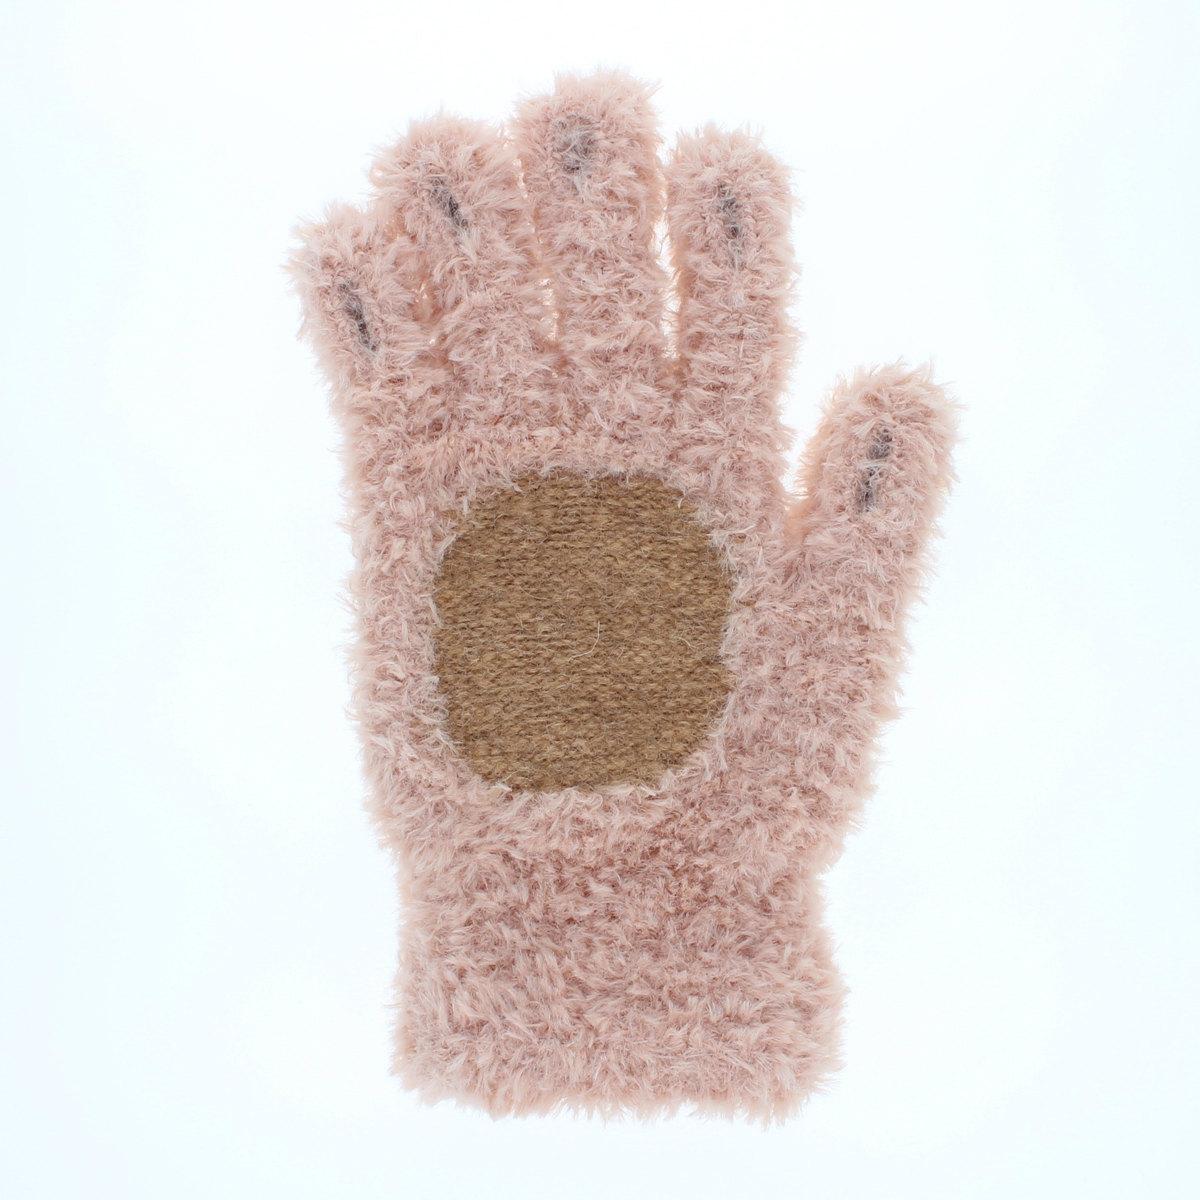 YUBIDERU ユビデル 指先が出る 指紋認証ラクラク アニマル手袋 レディース ティーンズ ニット手袋 イヌ柄